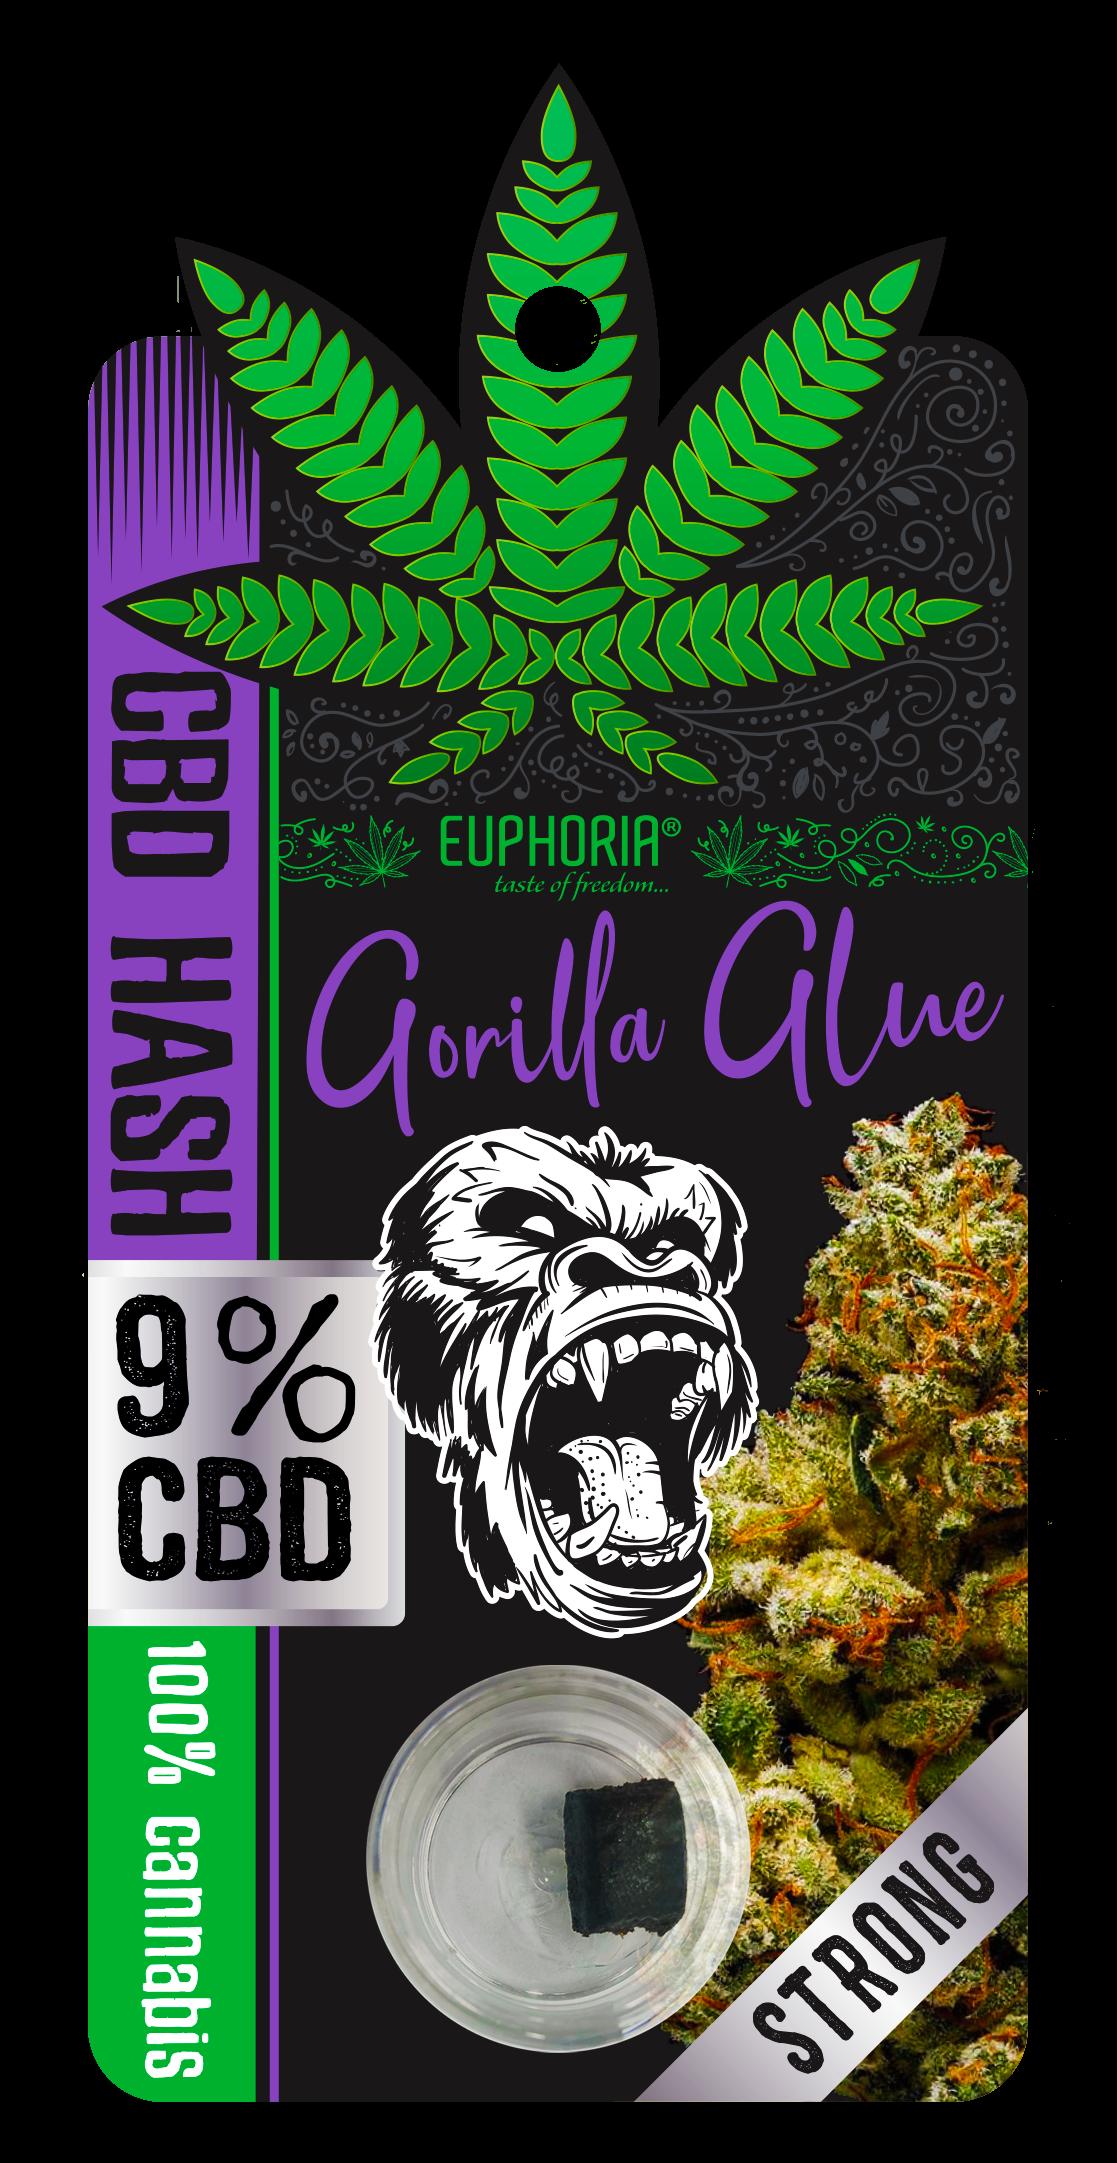 CBD Hash 9% Gorilla Glue | EUPHORIA - Cannabis Food & Drinks